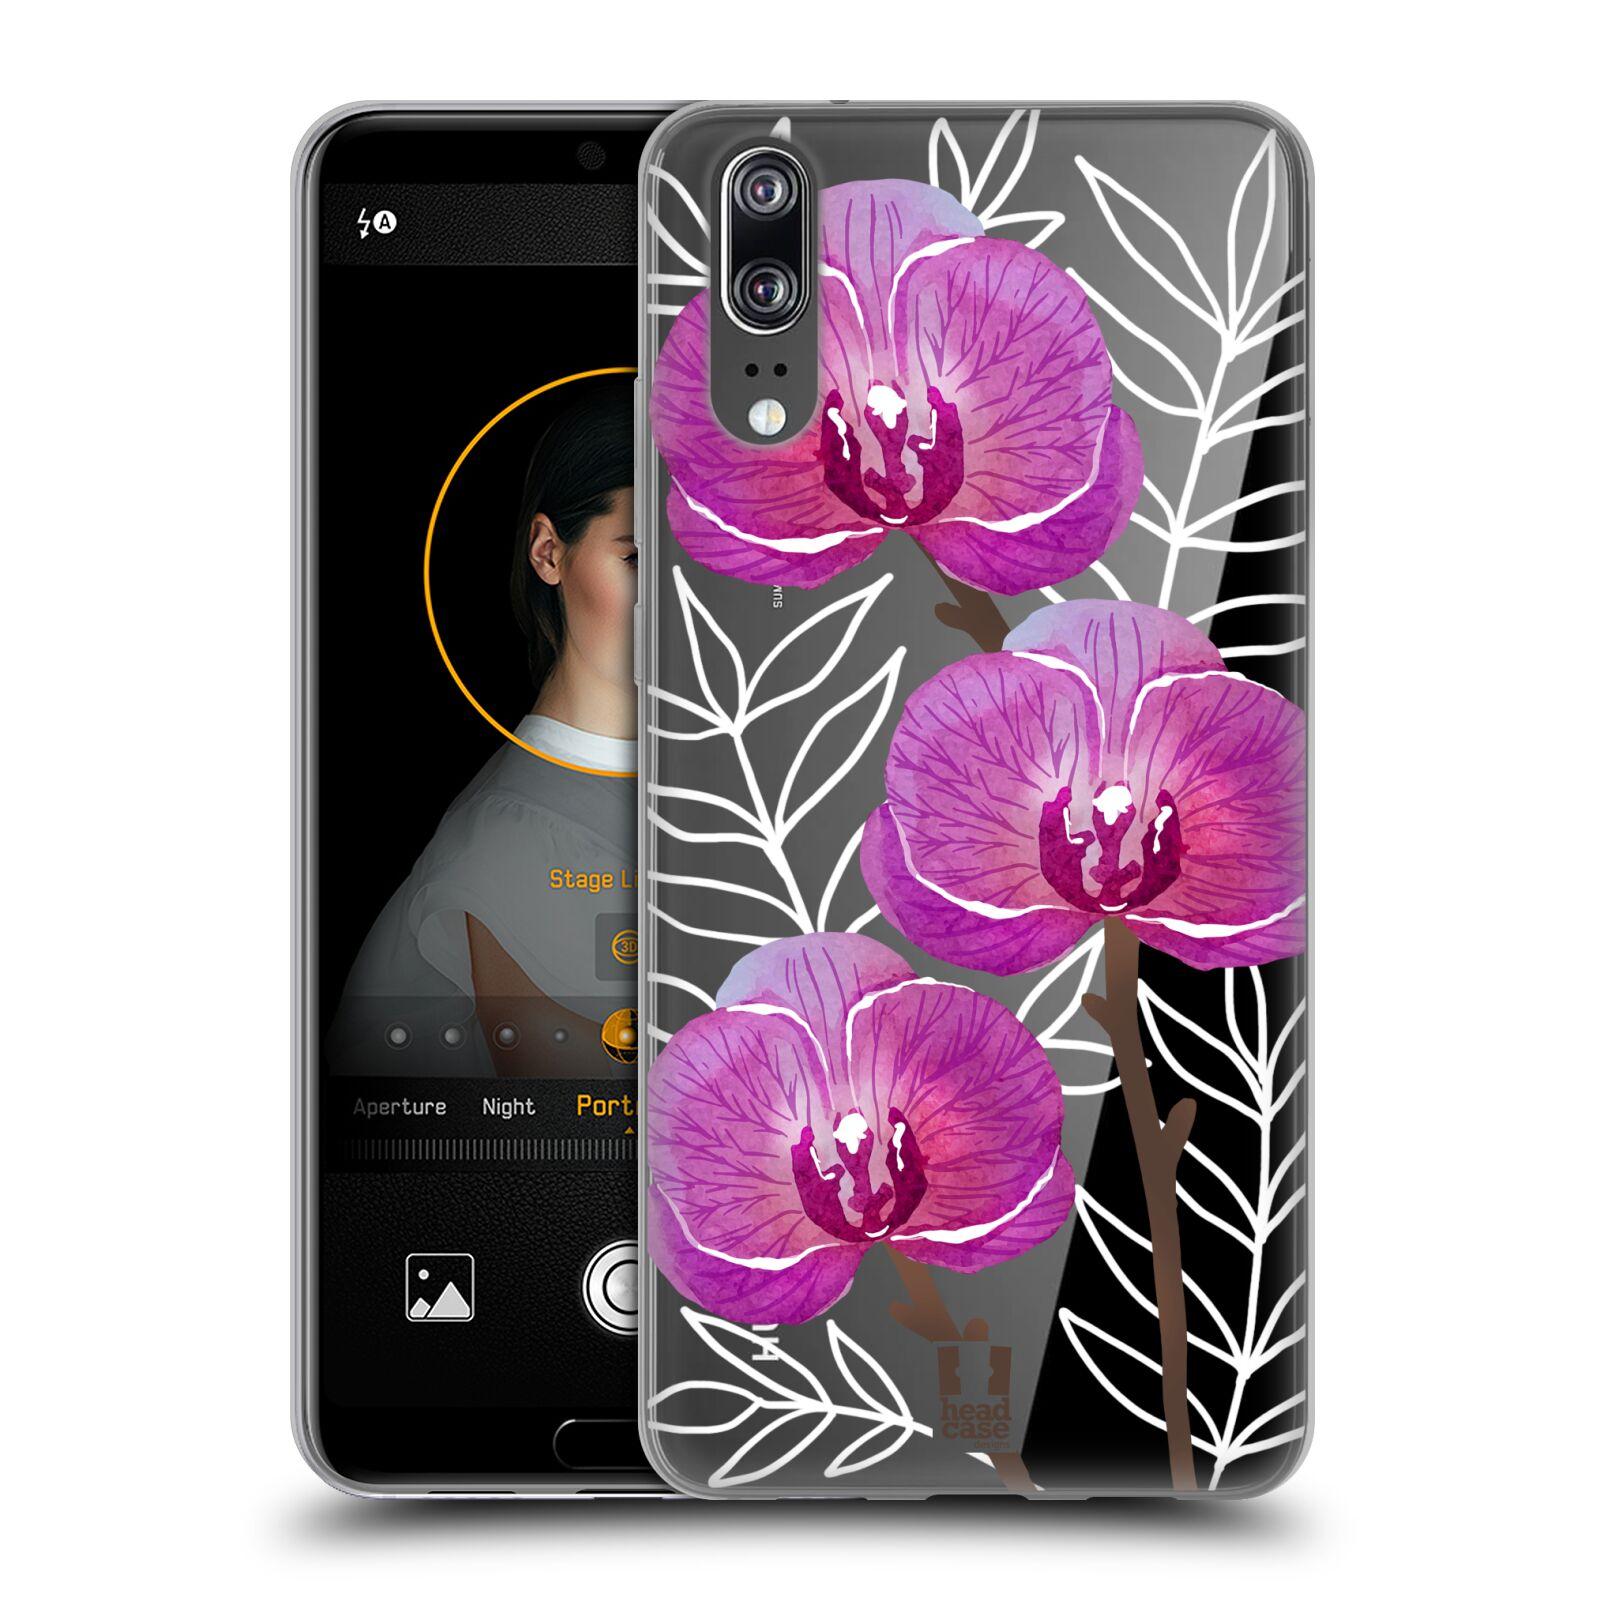 Silikonové pouzdro na mobil Huawei P20 - Head Case - Hezoučké kvítky - průhledné